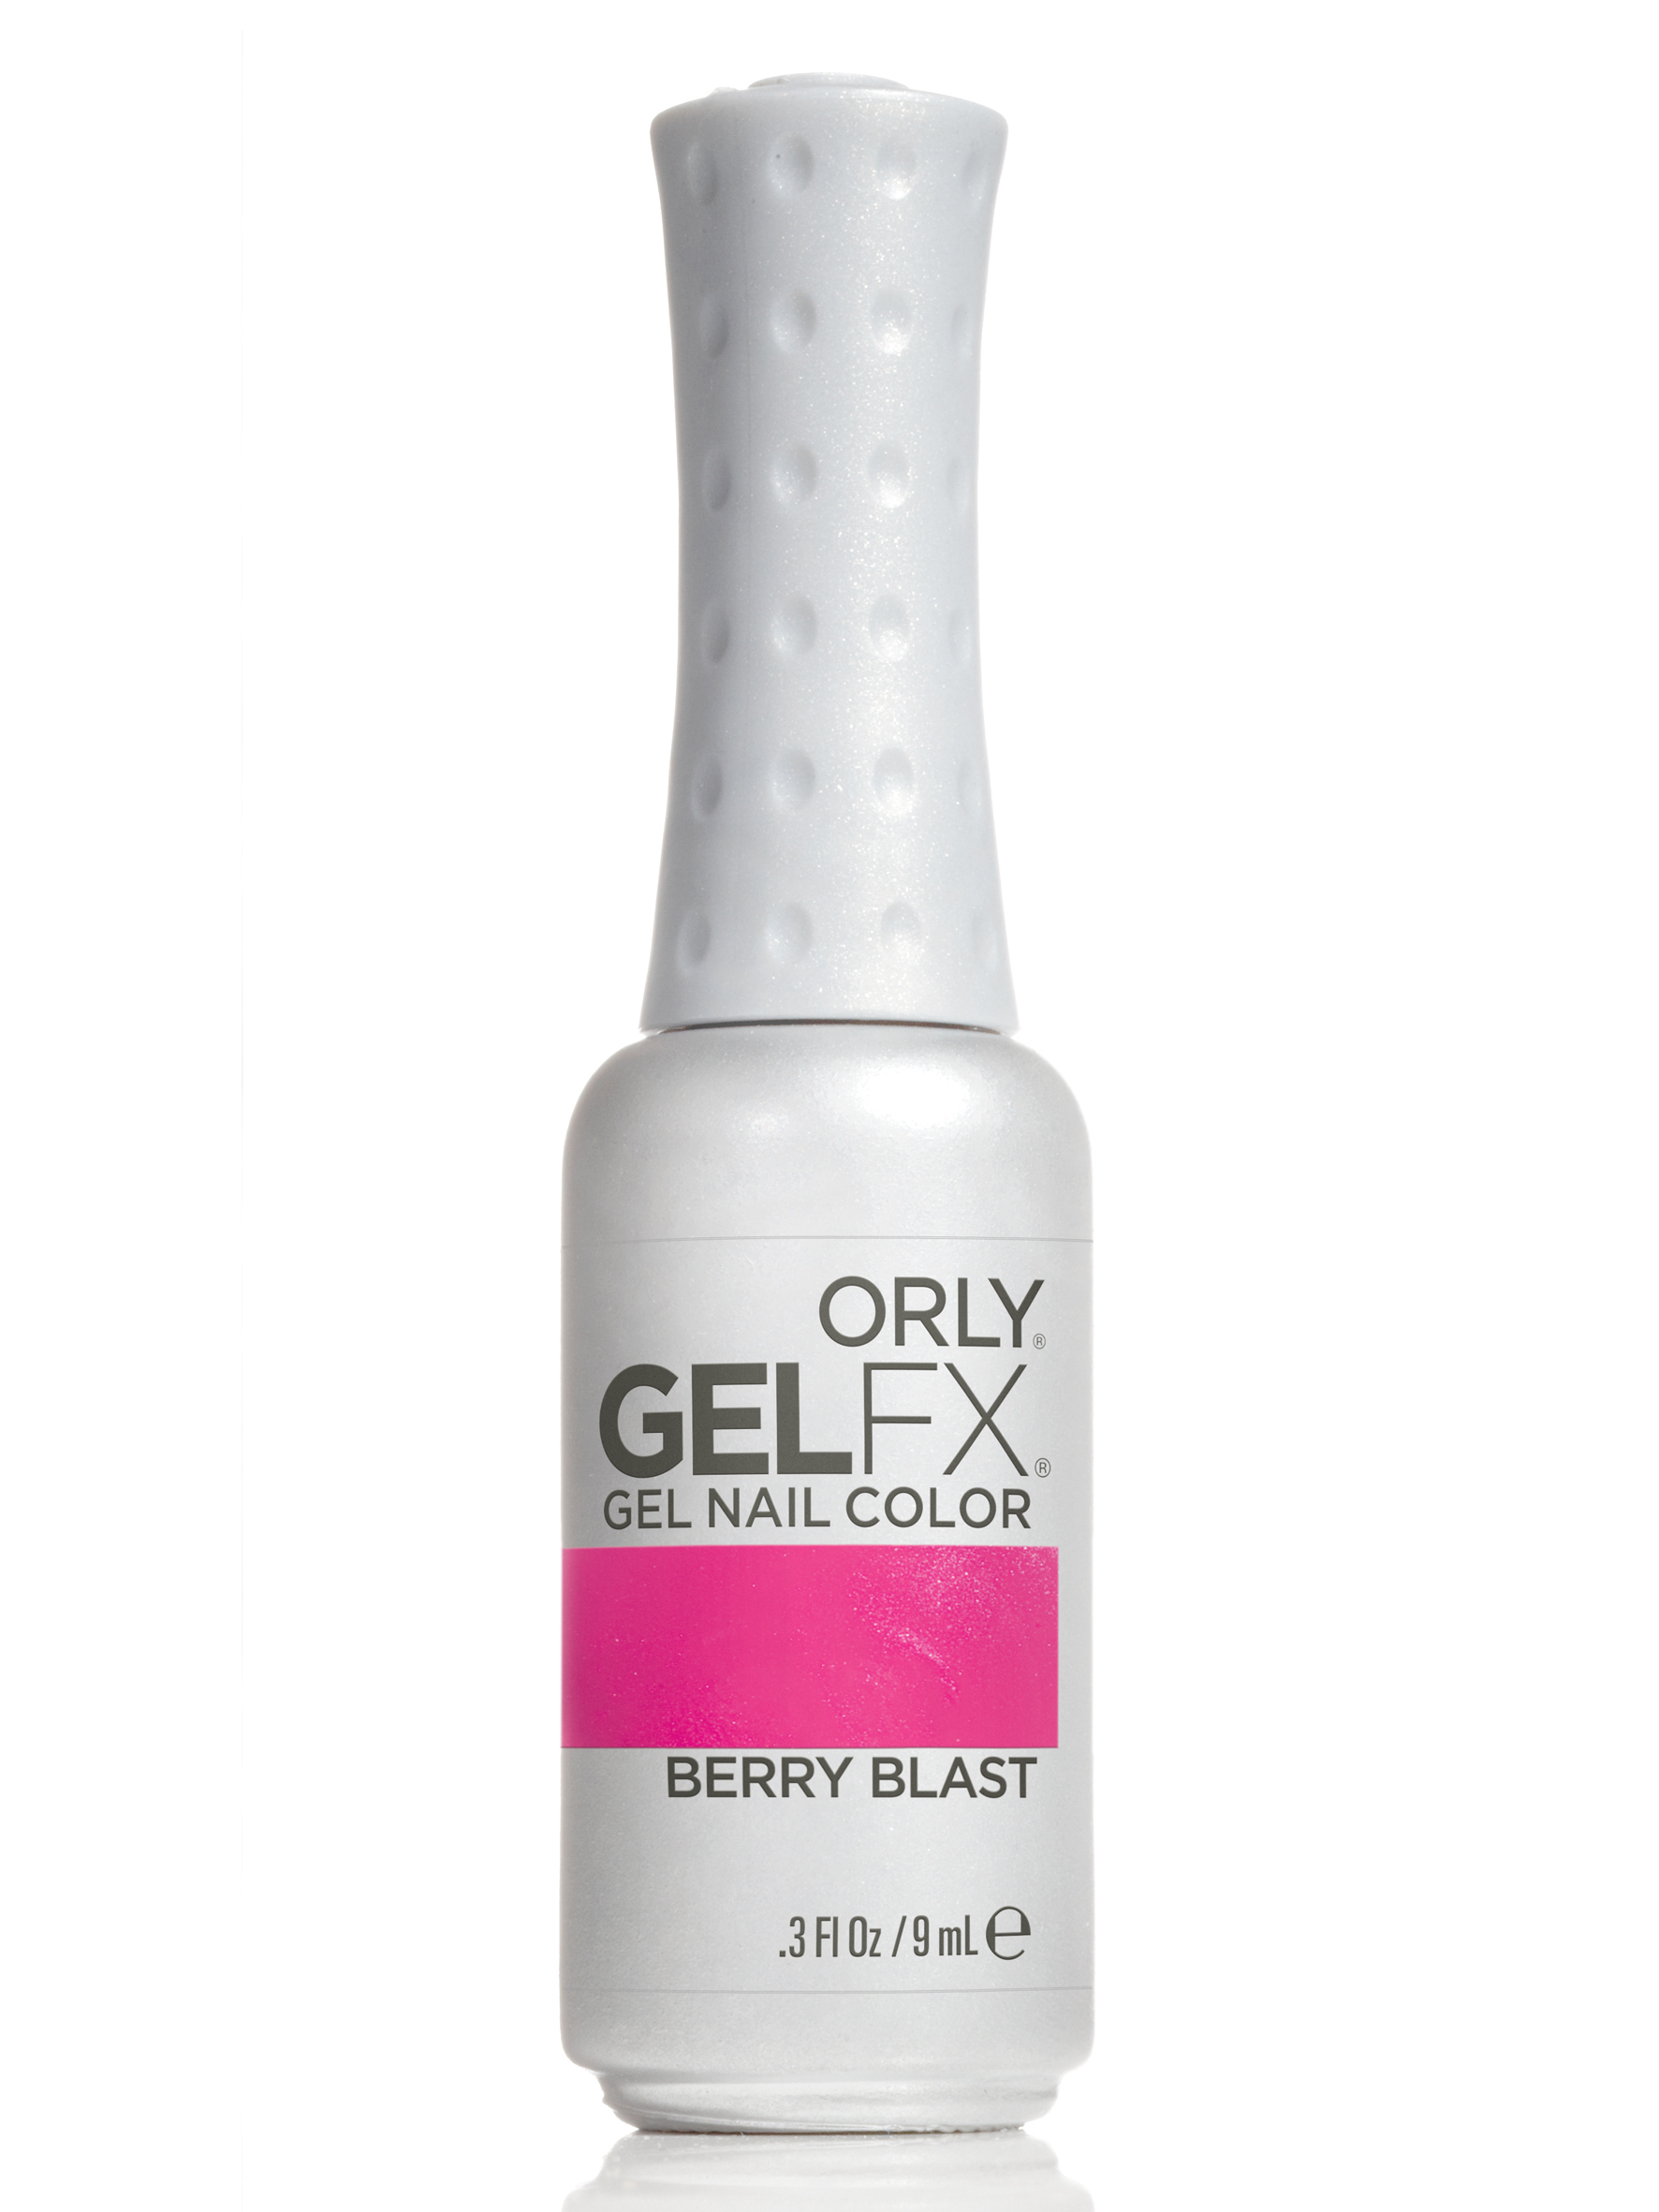 ORLY Гель-лак 501 BERRY BLAST / GEL FX 9мл orly гель лак 31 rockin' amber flakie gel fx 9мл